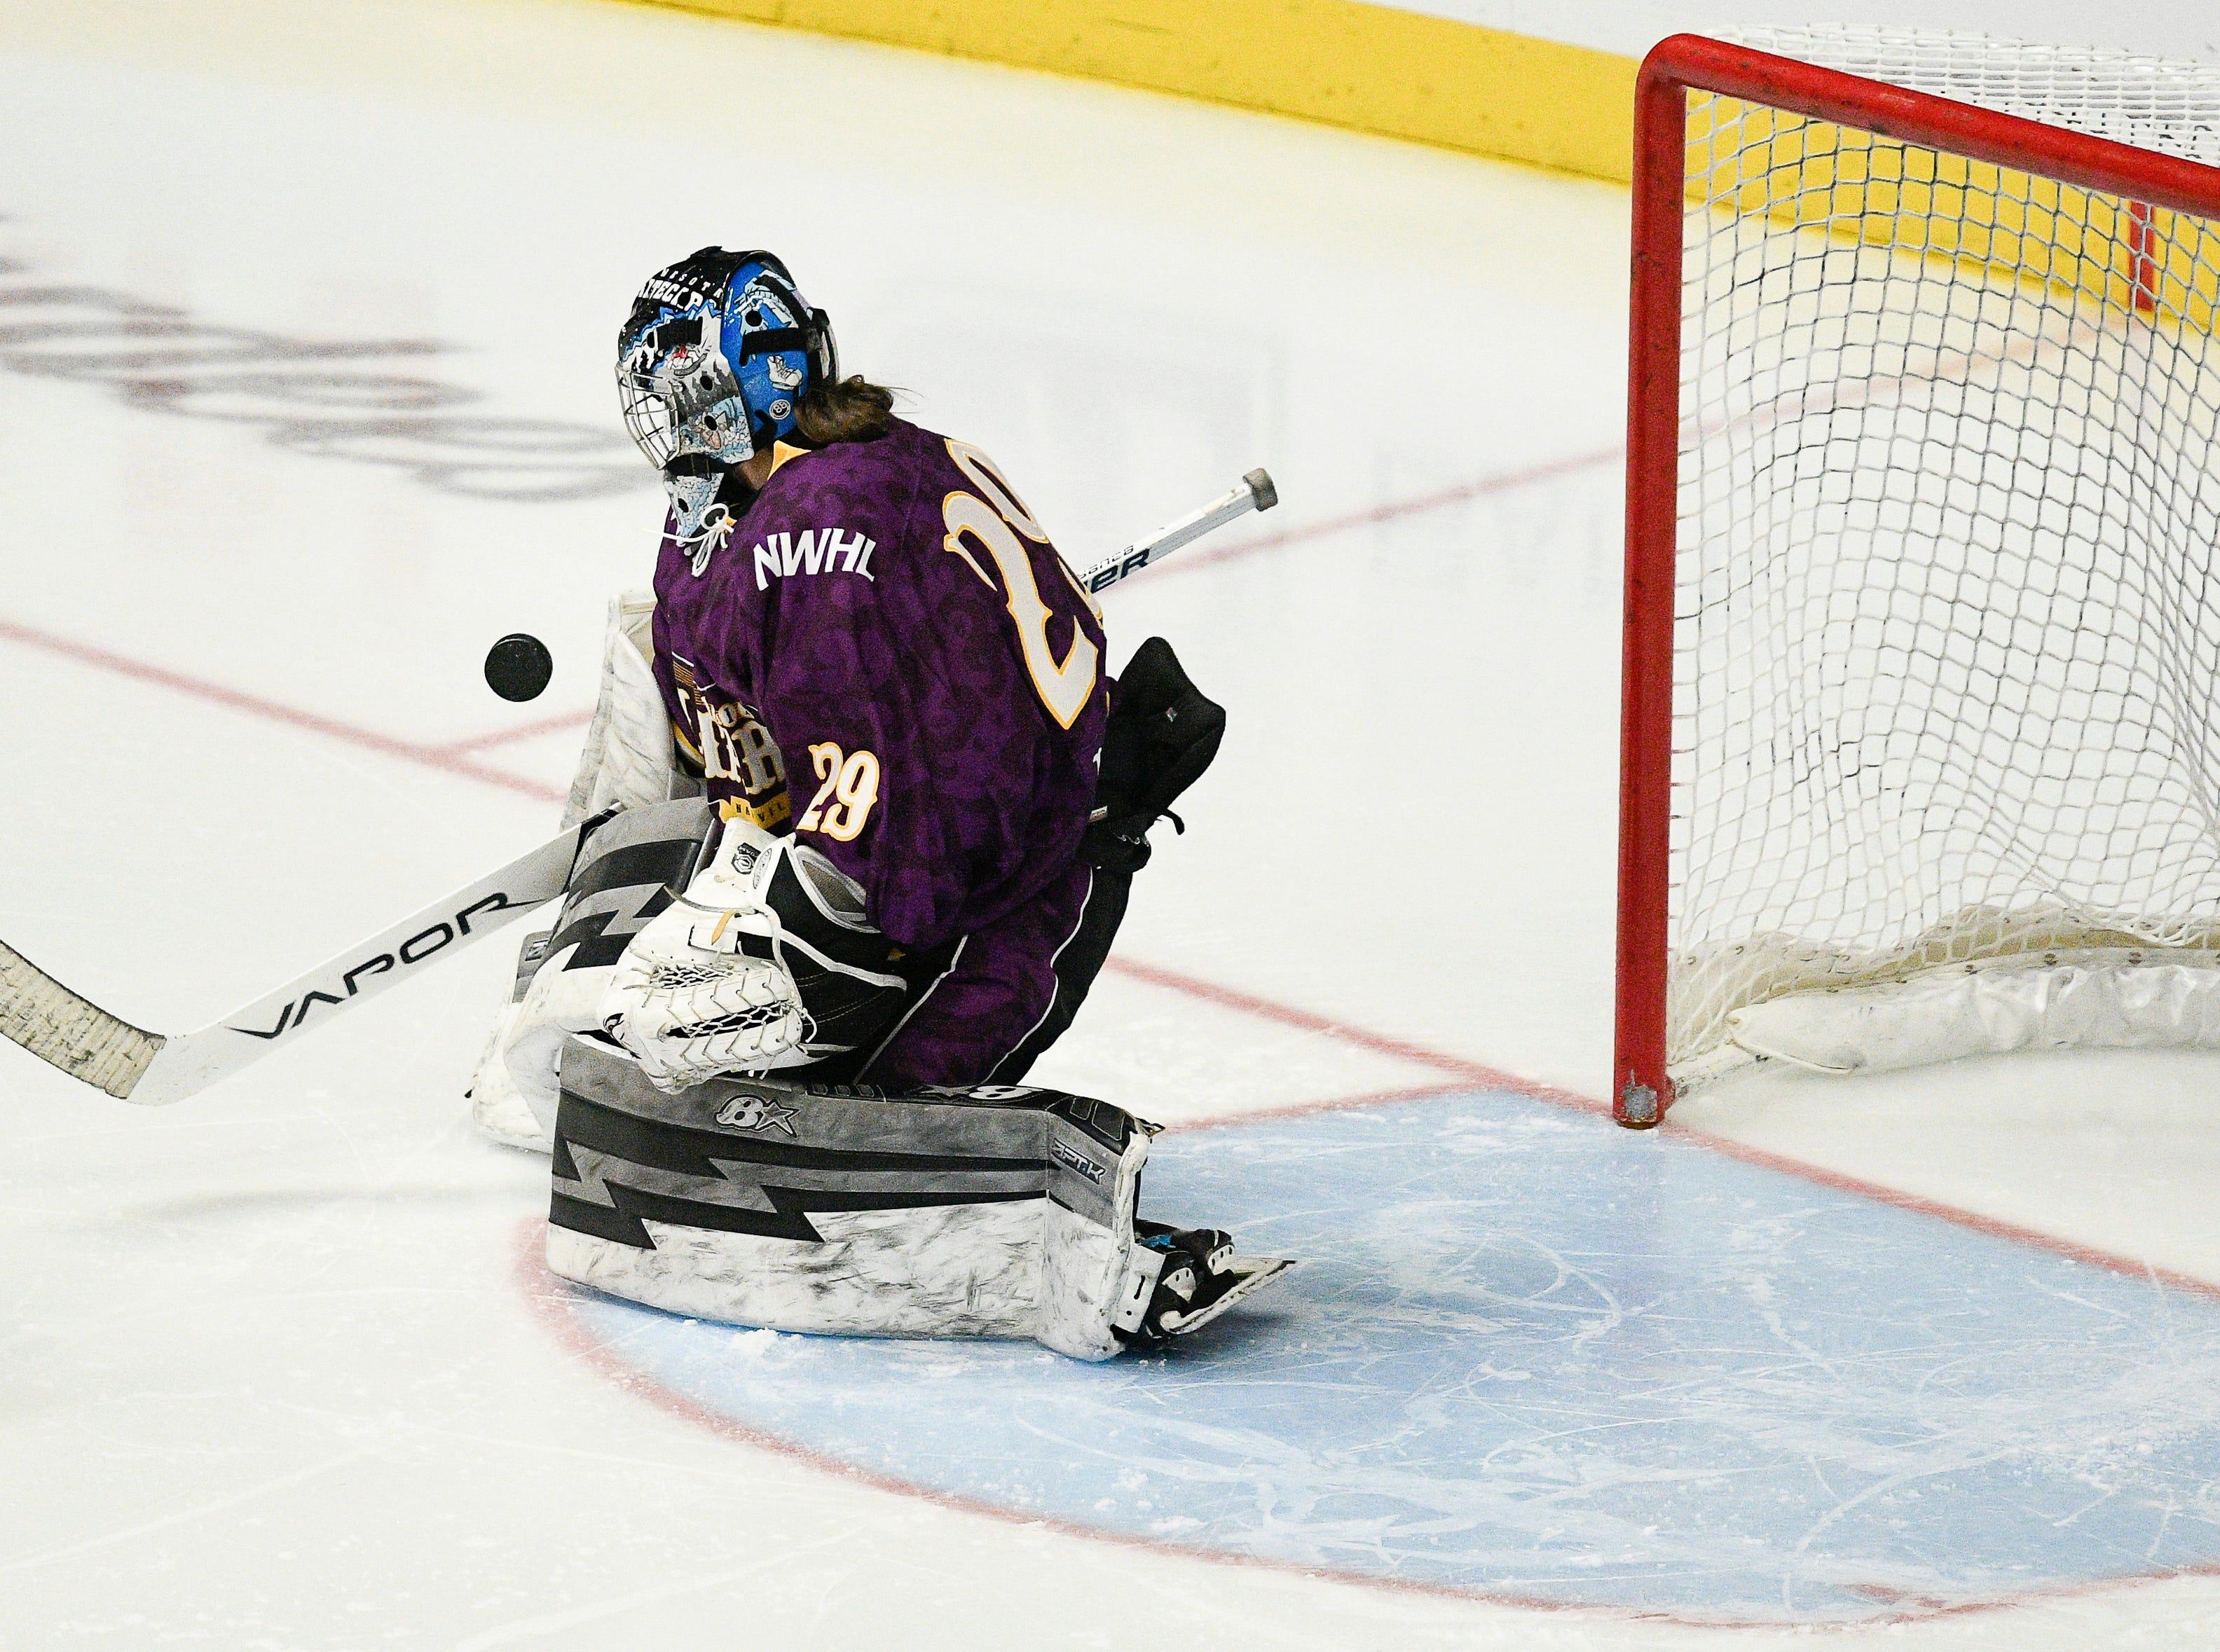 Team Stecklein goalie Amanda Leveille blocks a shot during the NWHL All Star game at Bridgestone Arena Sunday Feb. 10, 2019 in Nashville, Tenn.